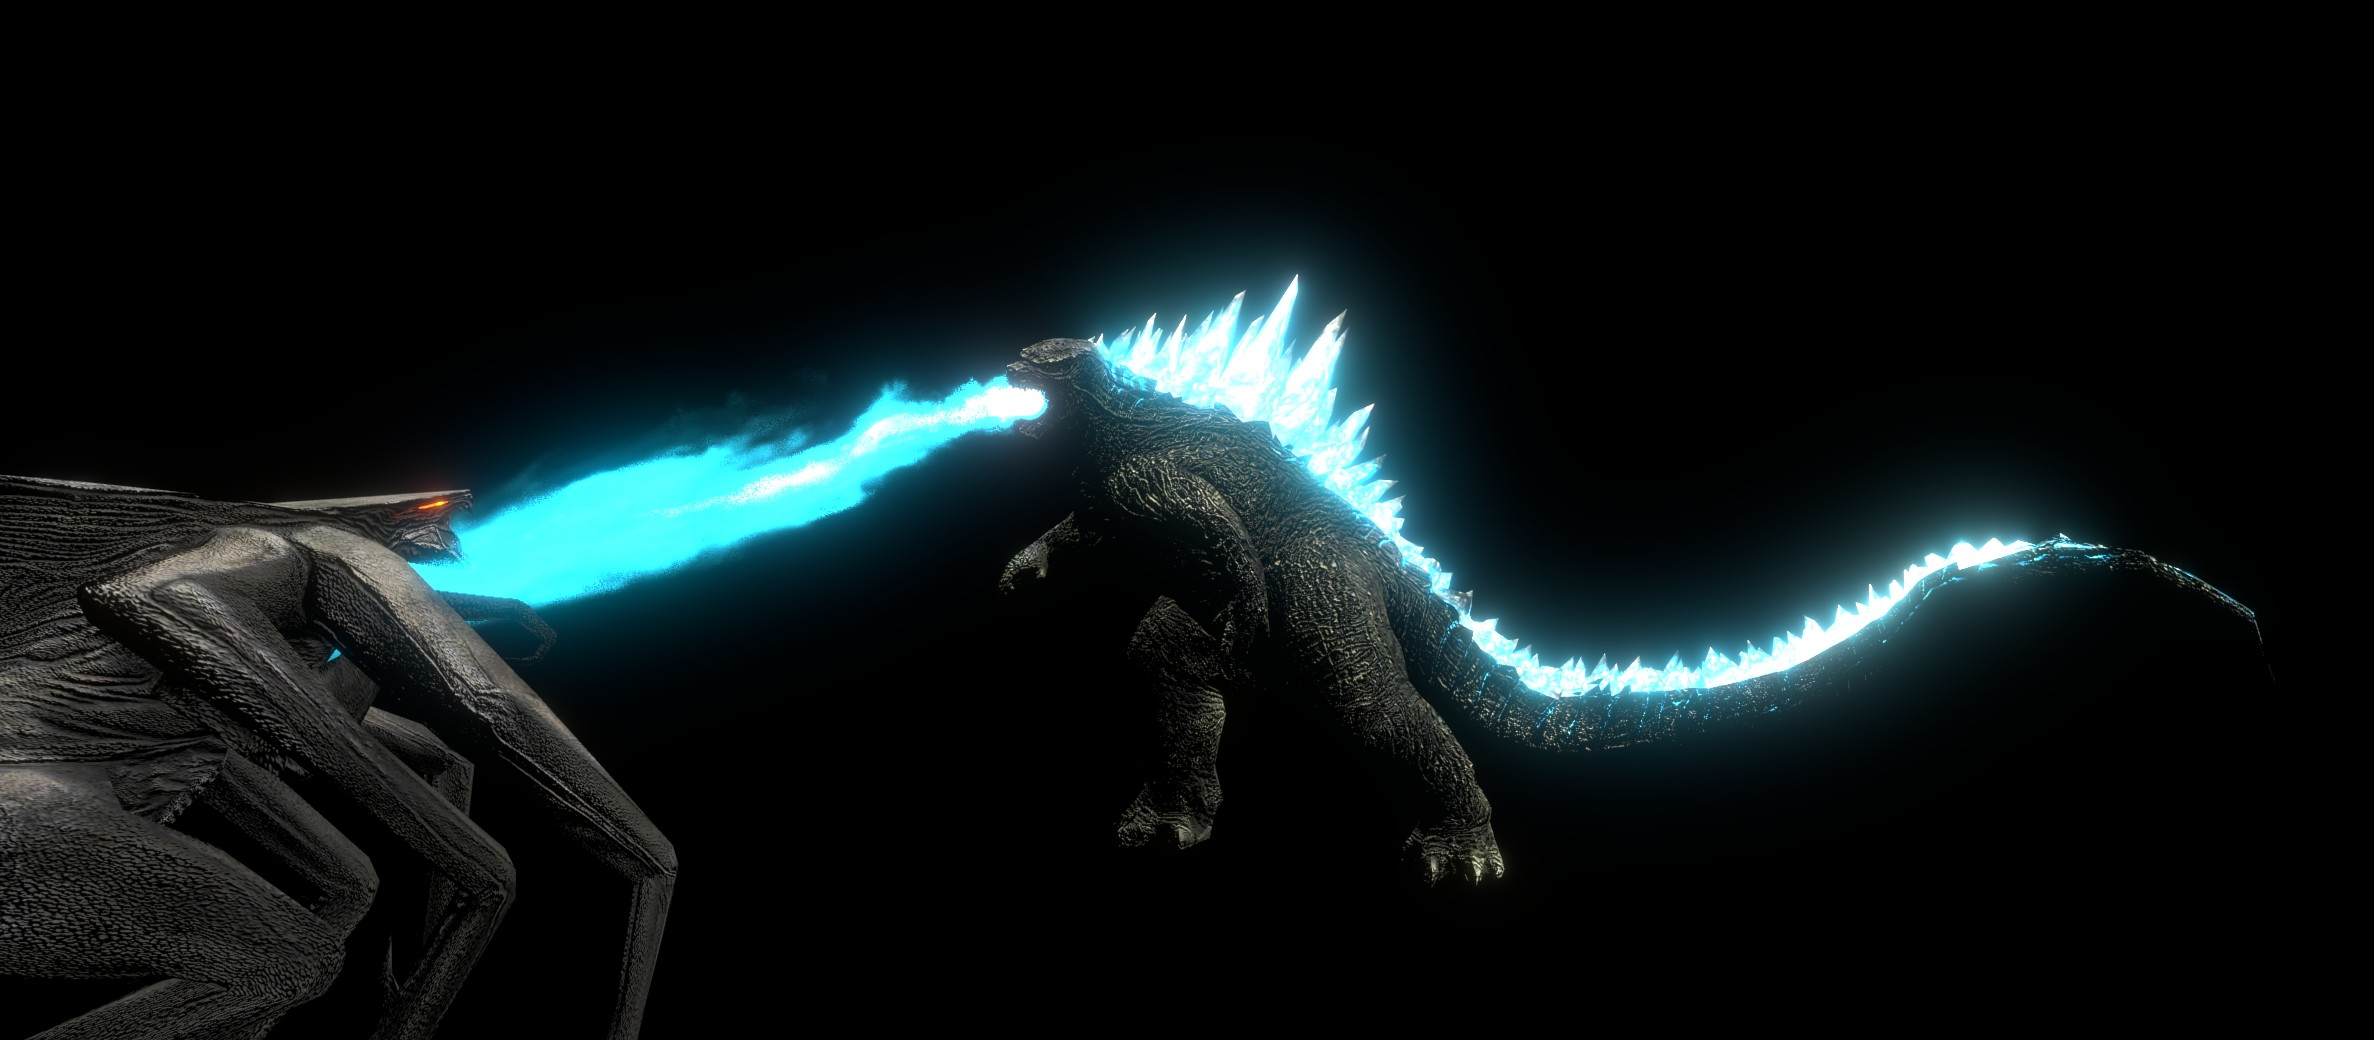 Godzilla 2014 vs Female Muto! by kingkong19100 on DeviantArt